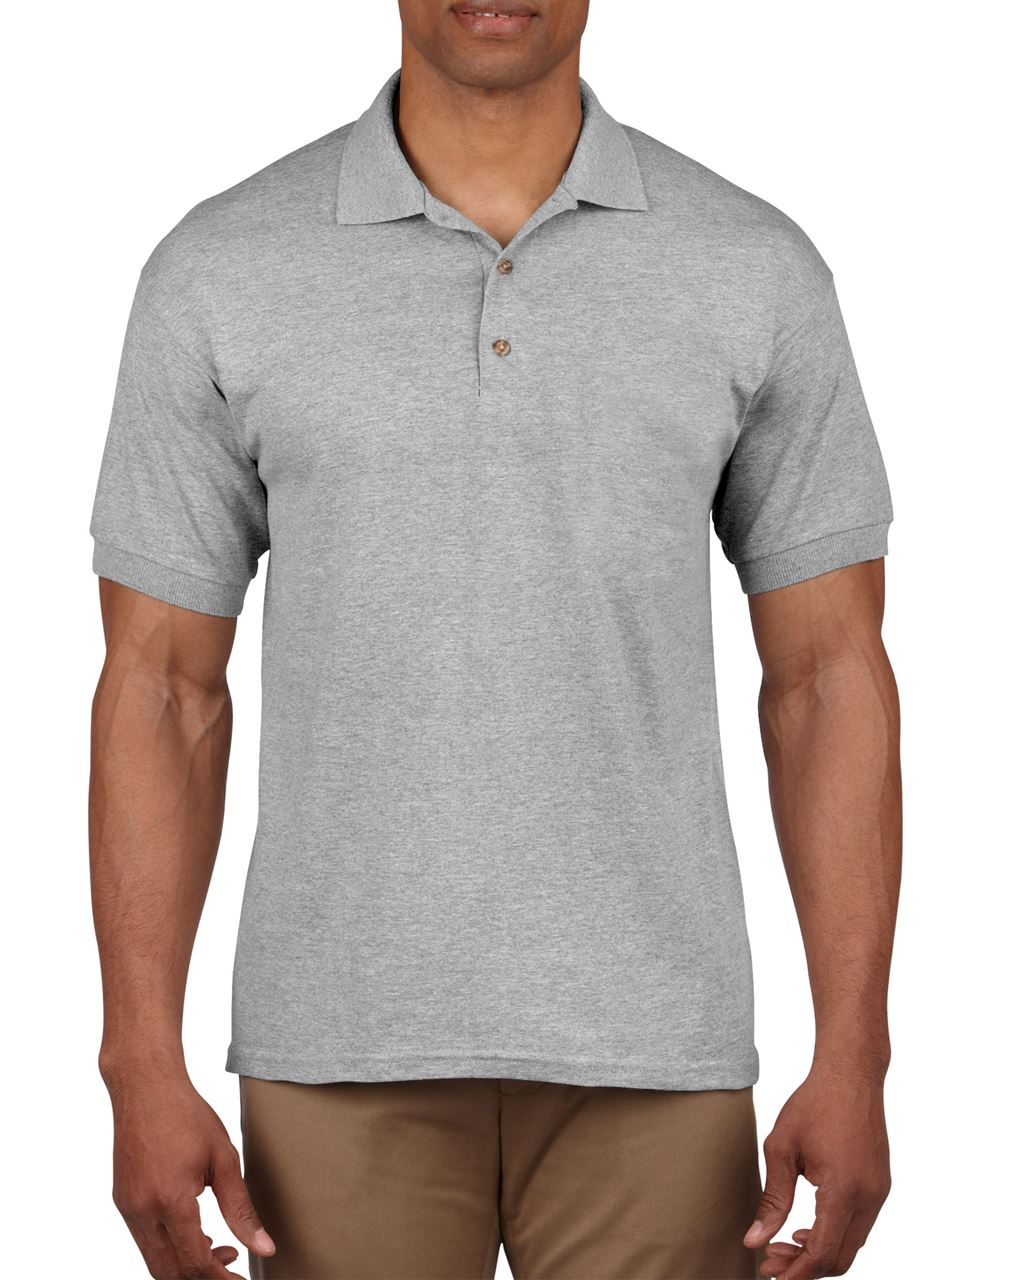 Tricou polo barbatesc Gildan Ultra Cotton bumbac 214 g/mp serigrafie termotransfer broderie | Toroadv.ro